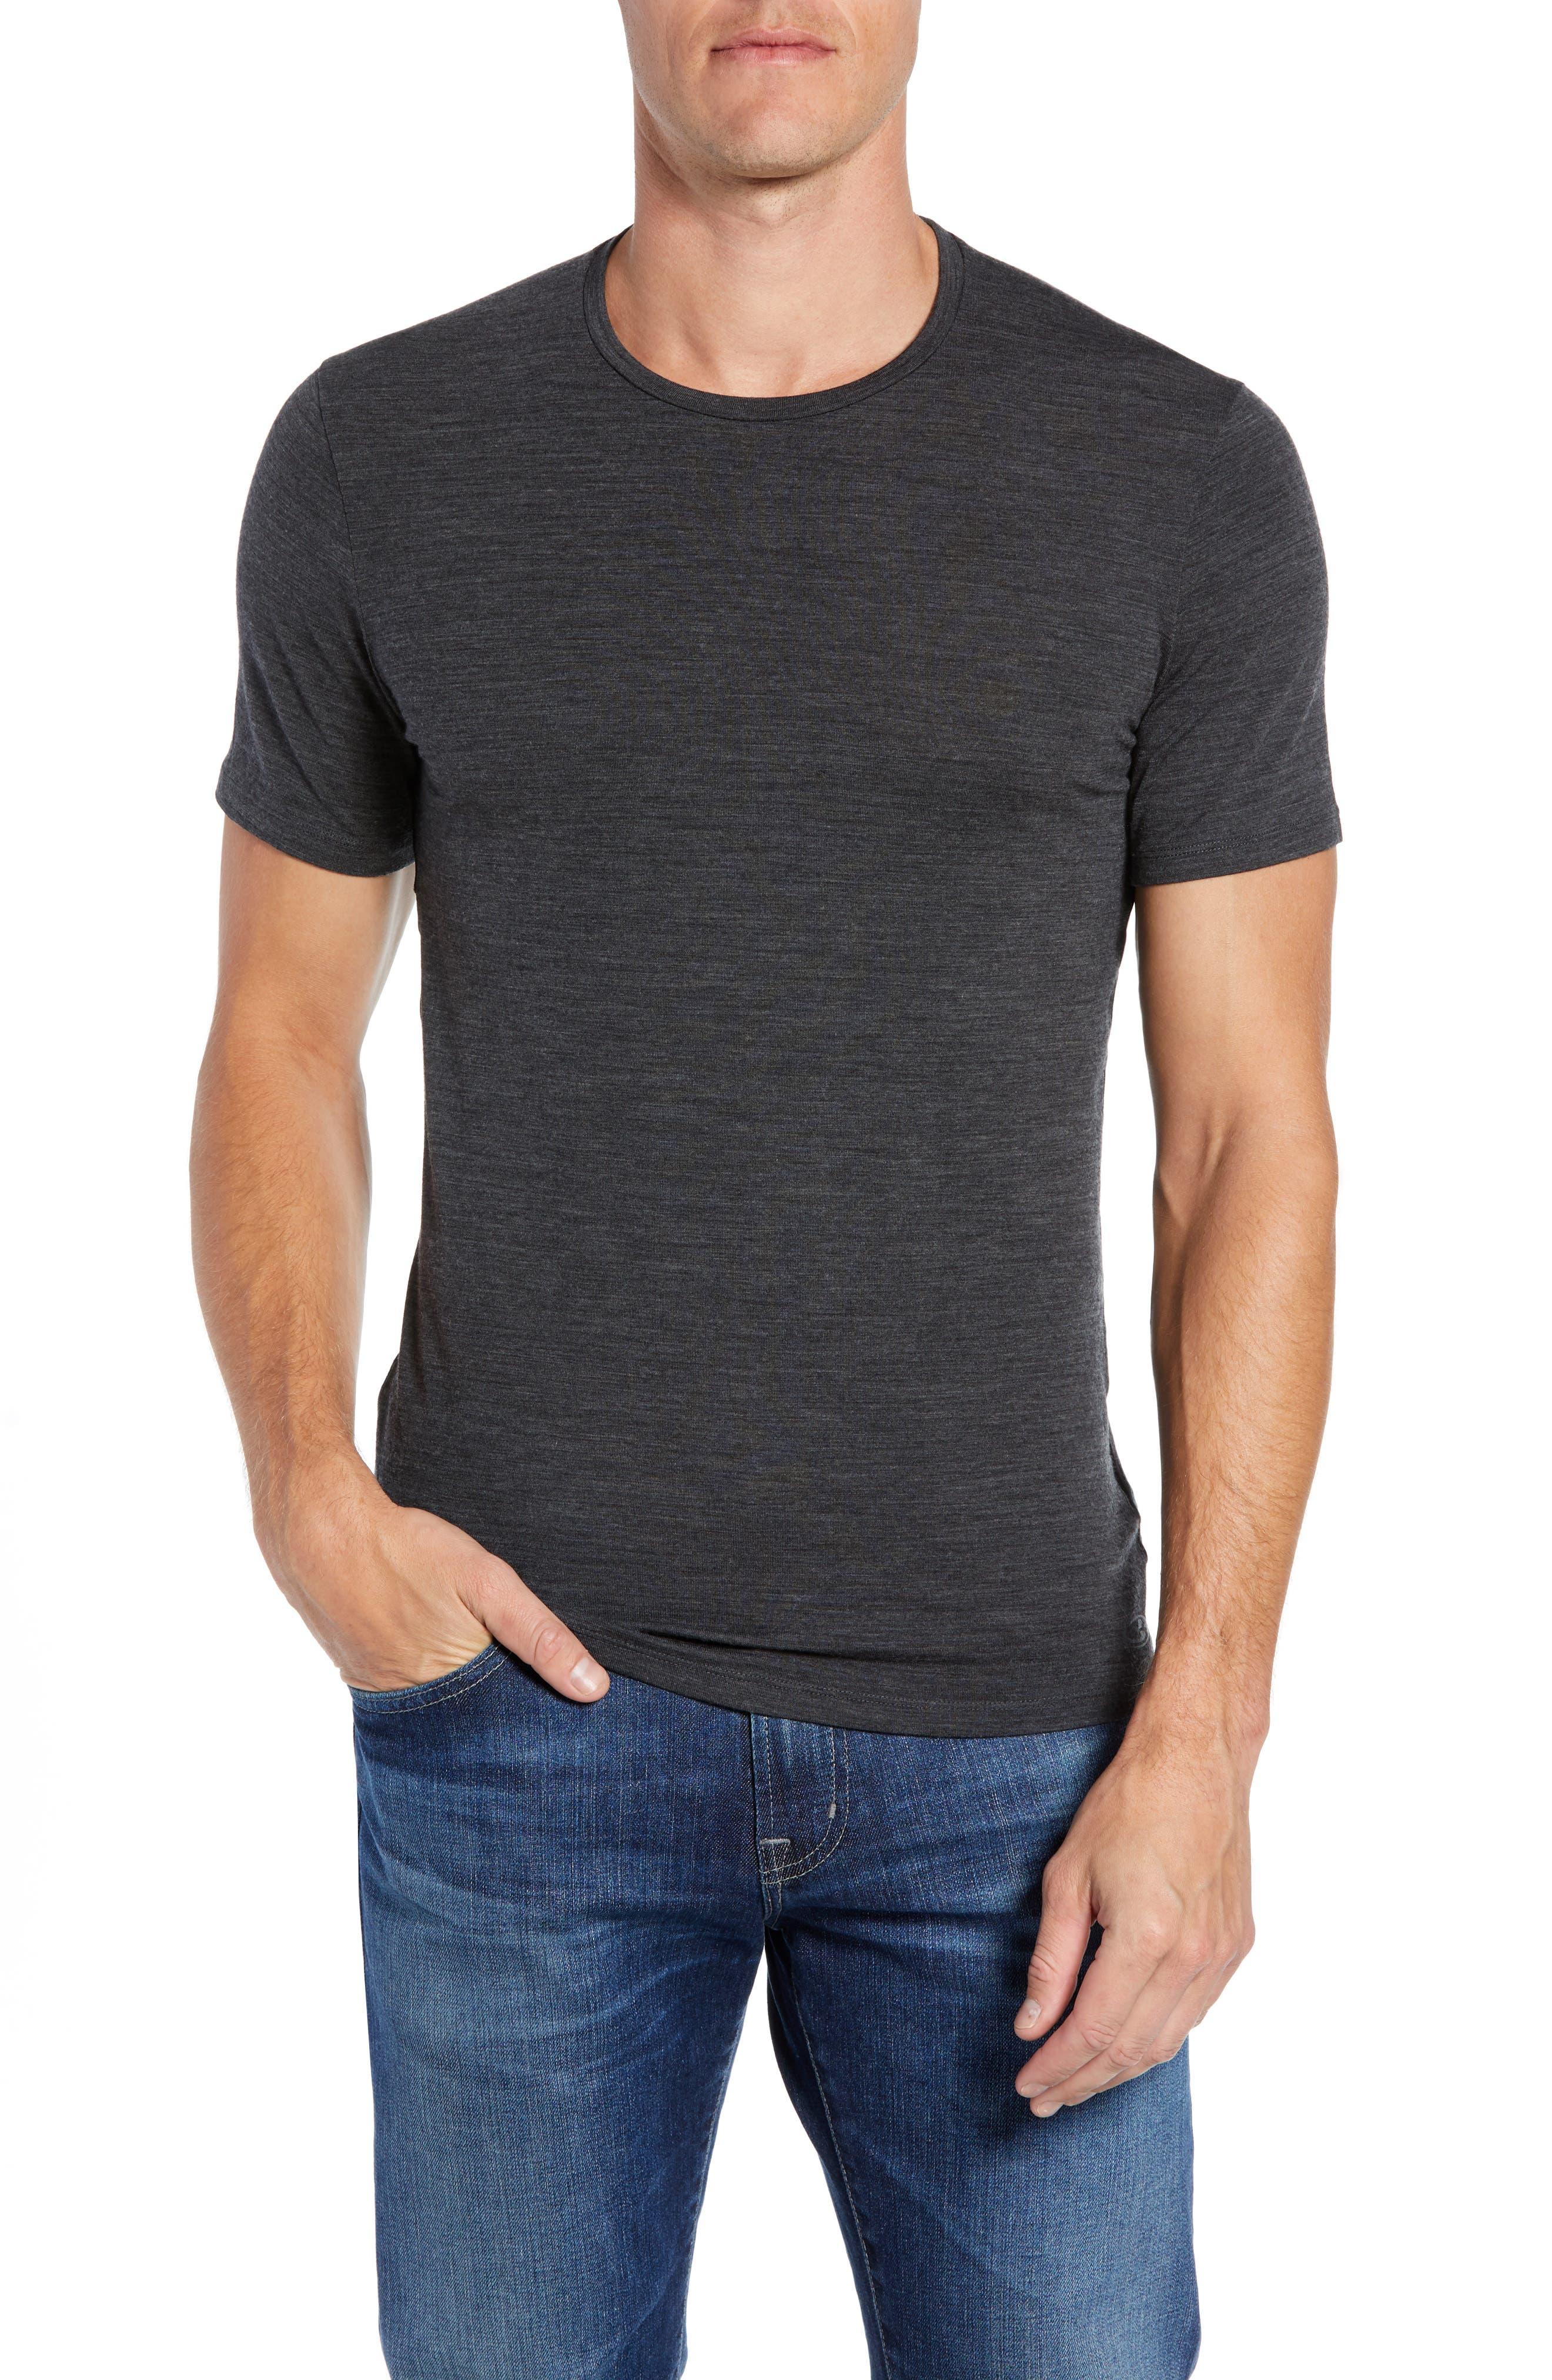 Icebreaker Anatomica Short Sleeve Crewneck T-Shirt